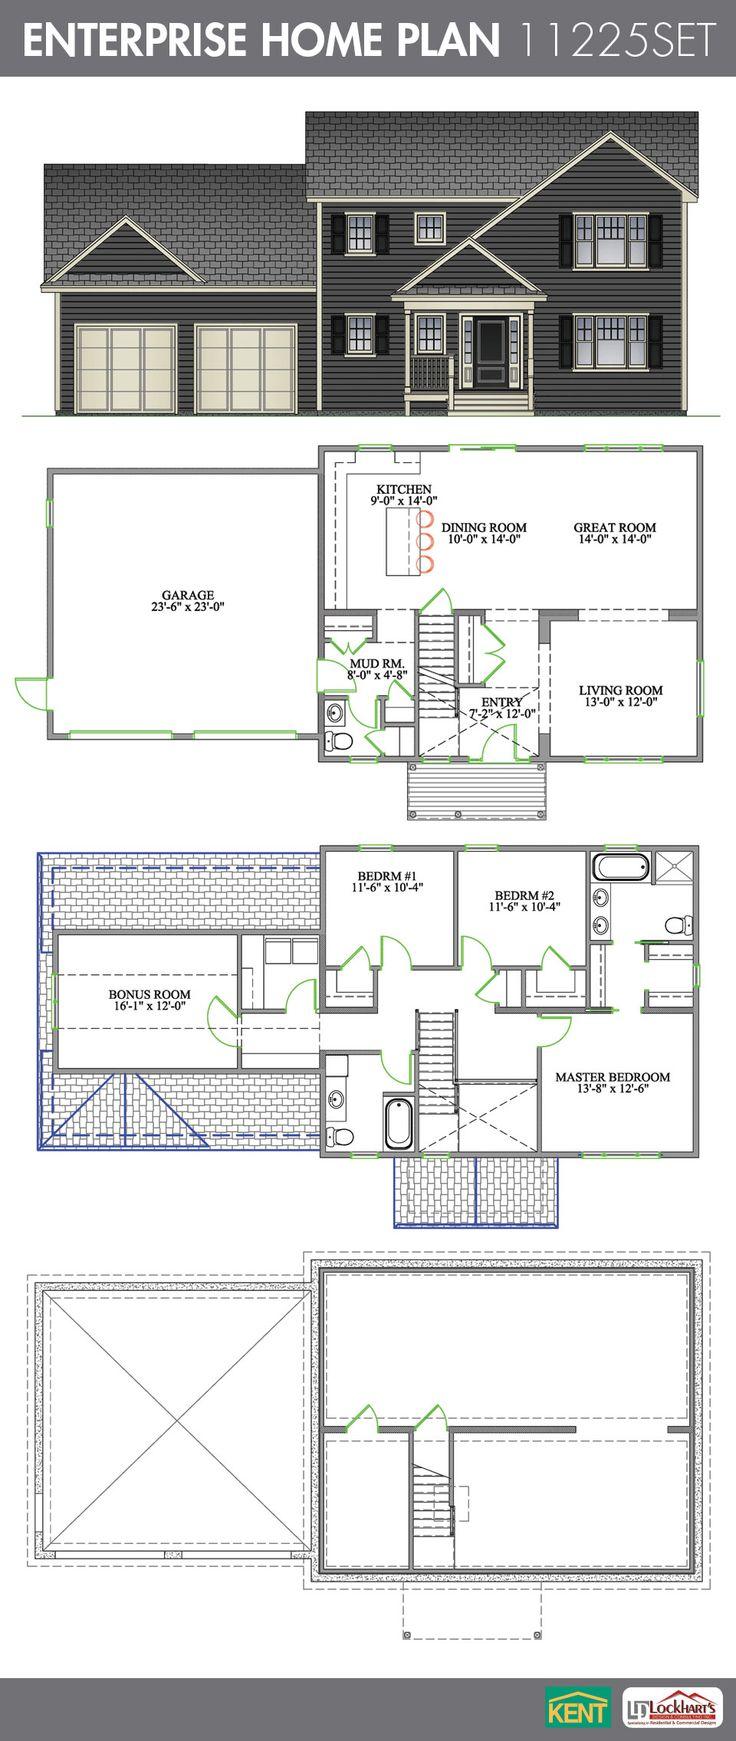 28 best 2 storey home plans images on pinterest home builder enterprise 3 bedroom 2 1 2 bath home plan features open